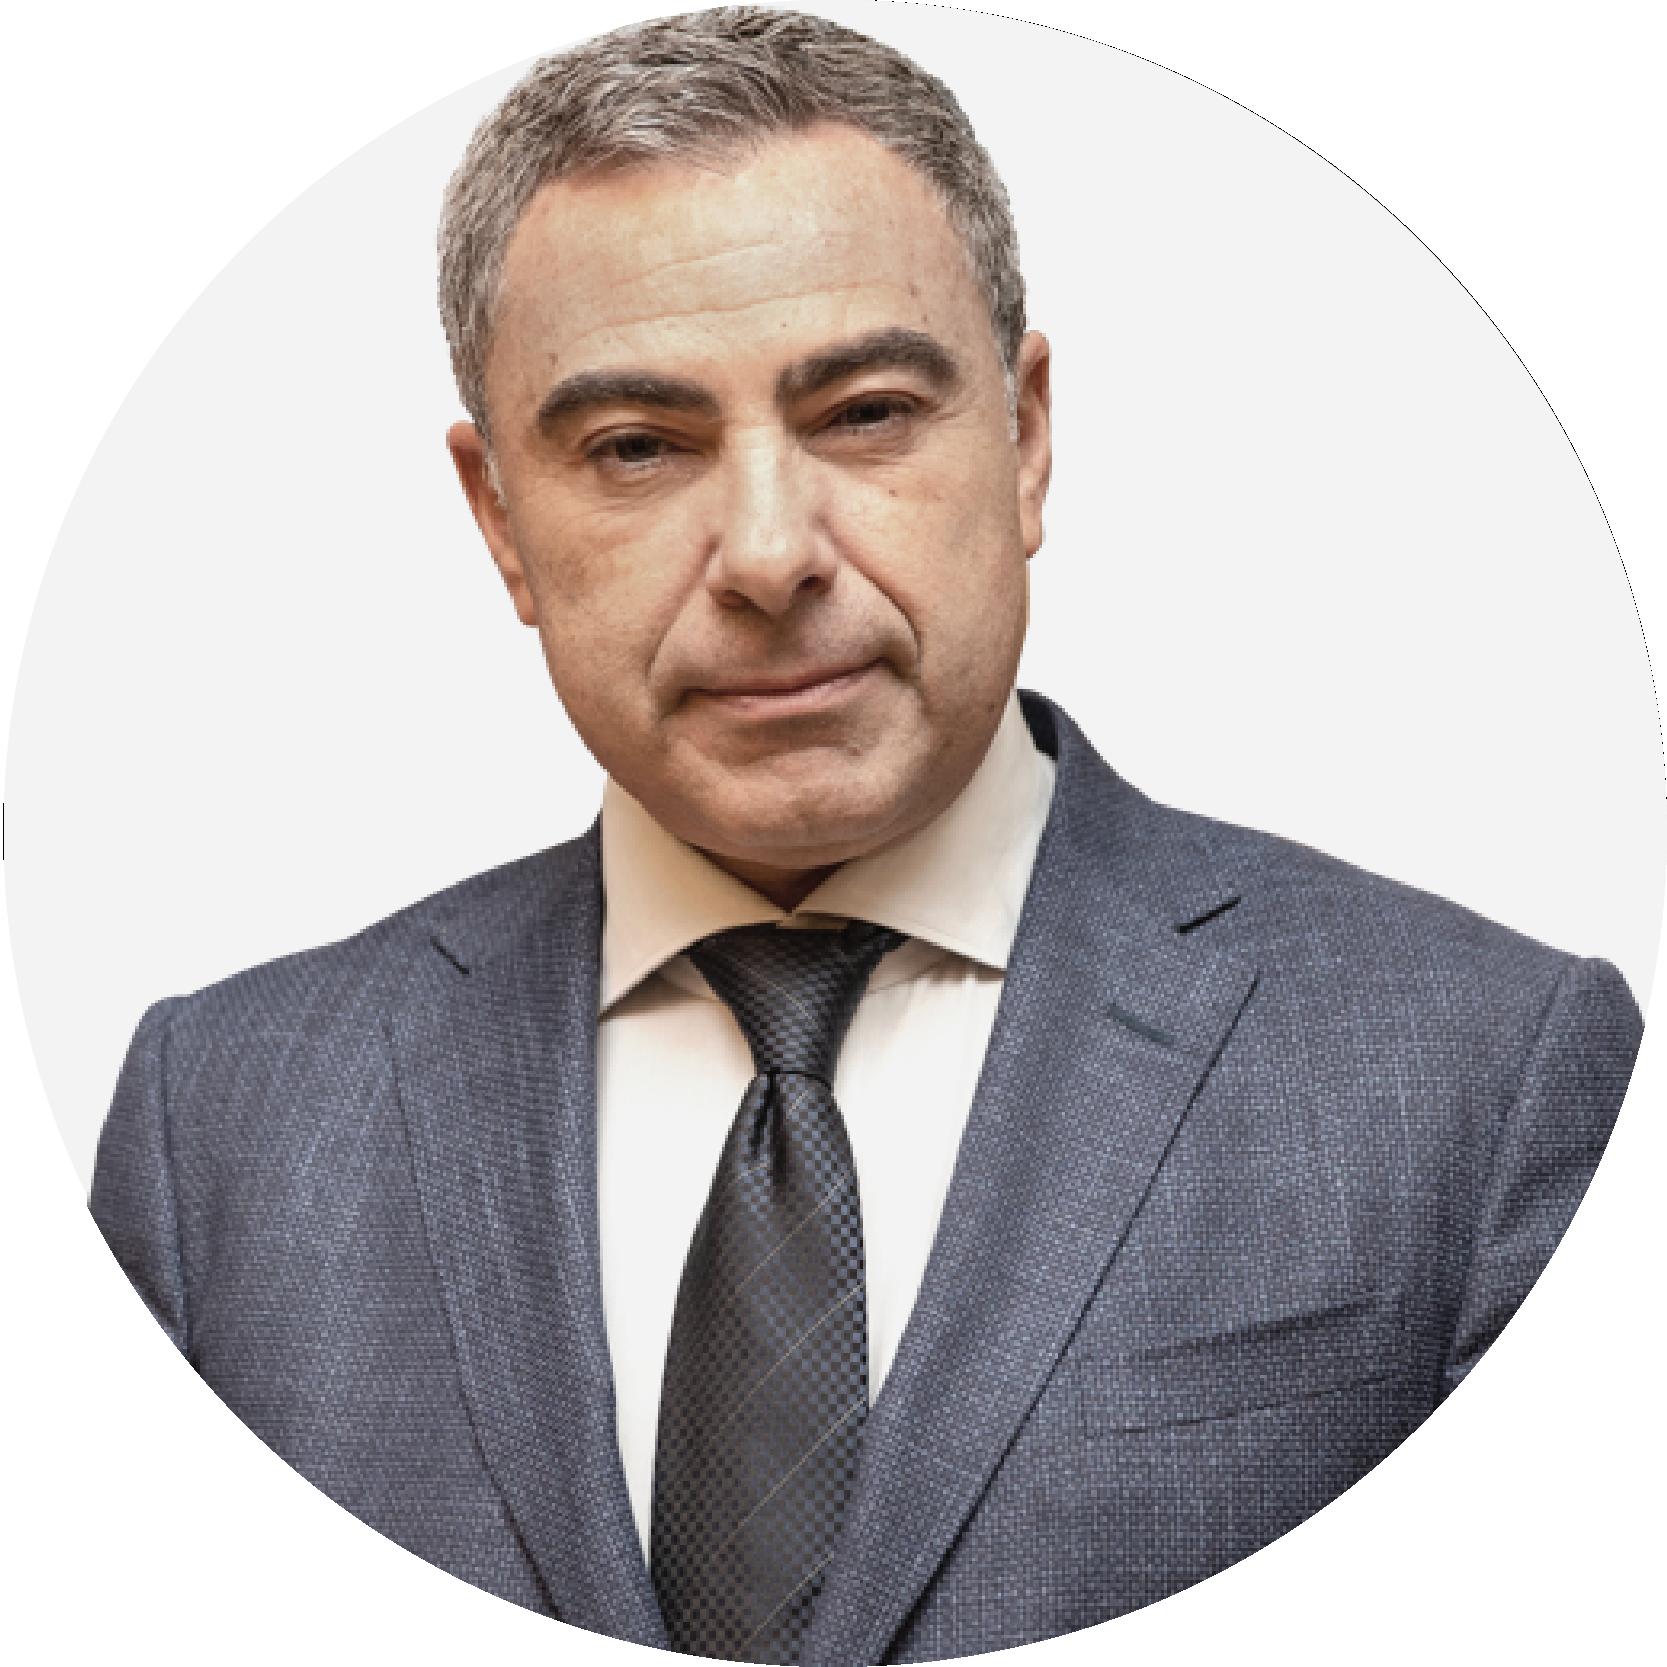 LeonShpilsky  Principal, Head of Corporate Development Oxford Sciences